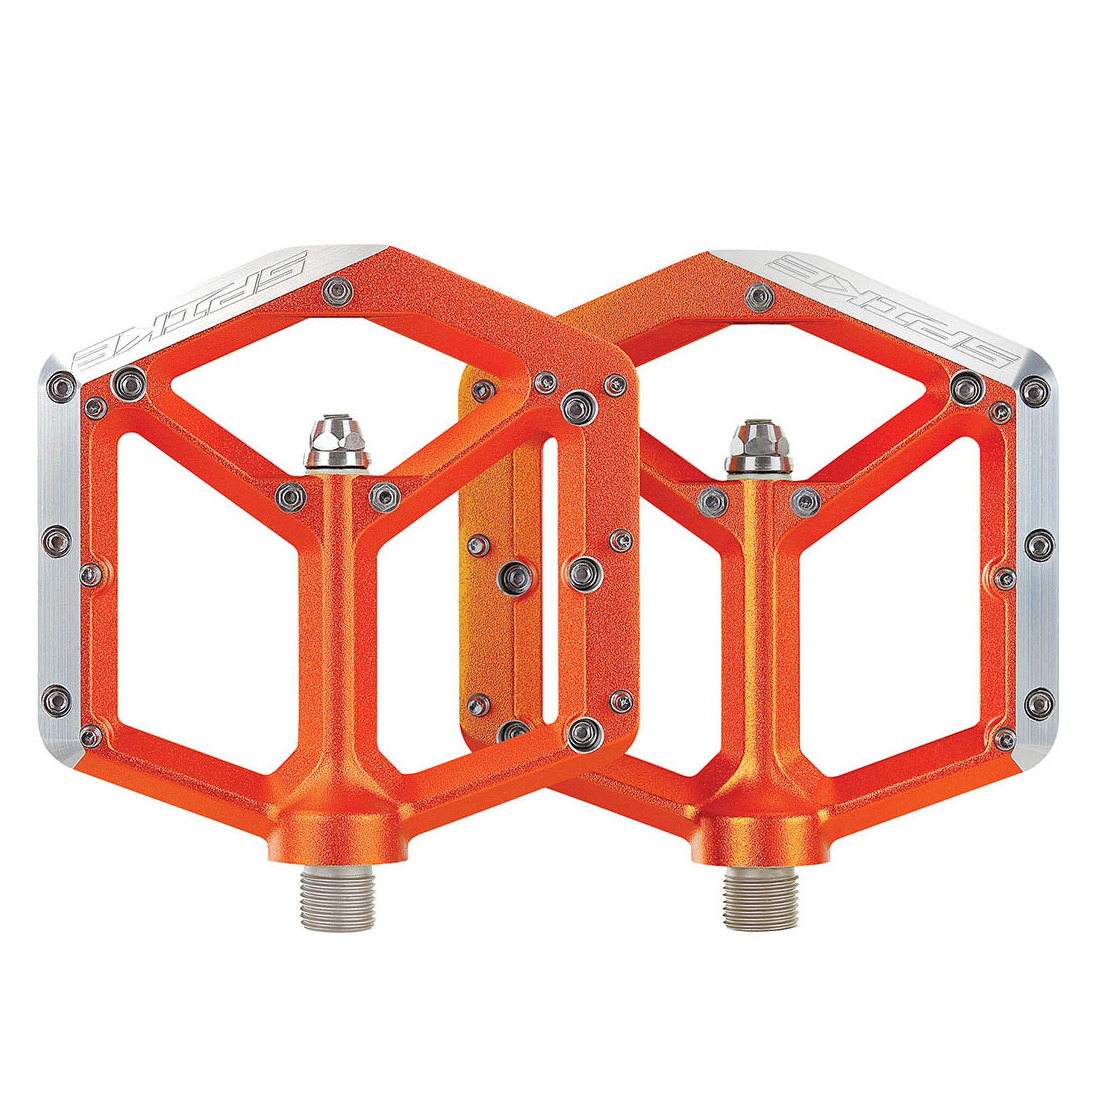 Spank Spike Flat Pedal 2016 - Orange online kaufen | BMO Bike-Mailorder